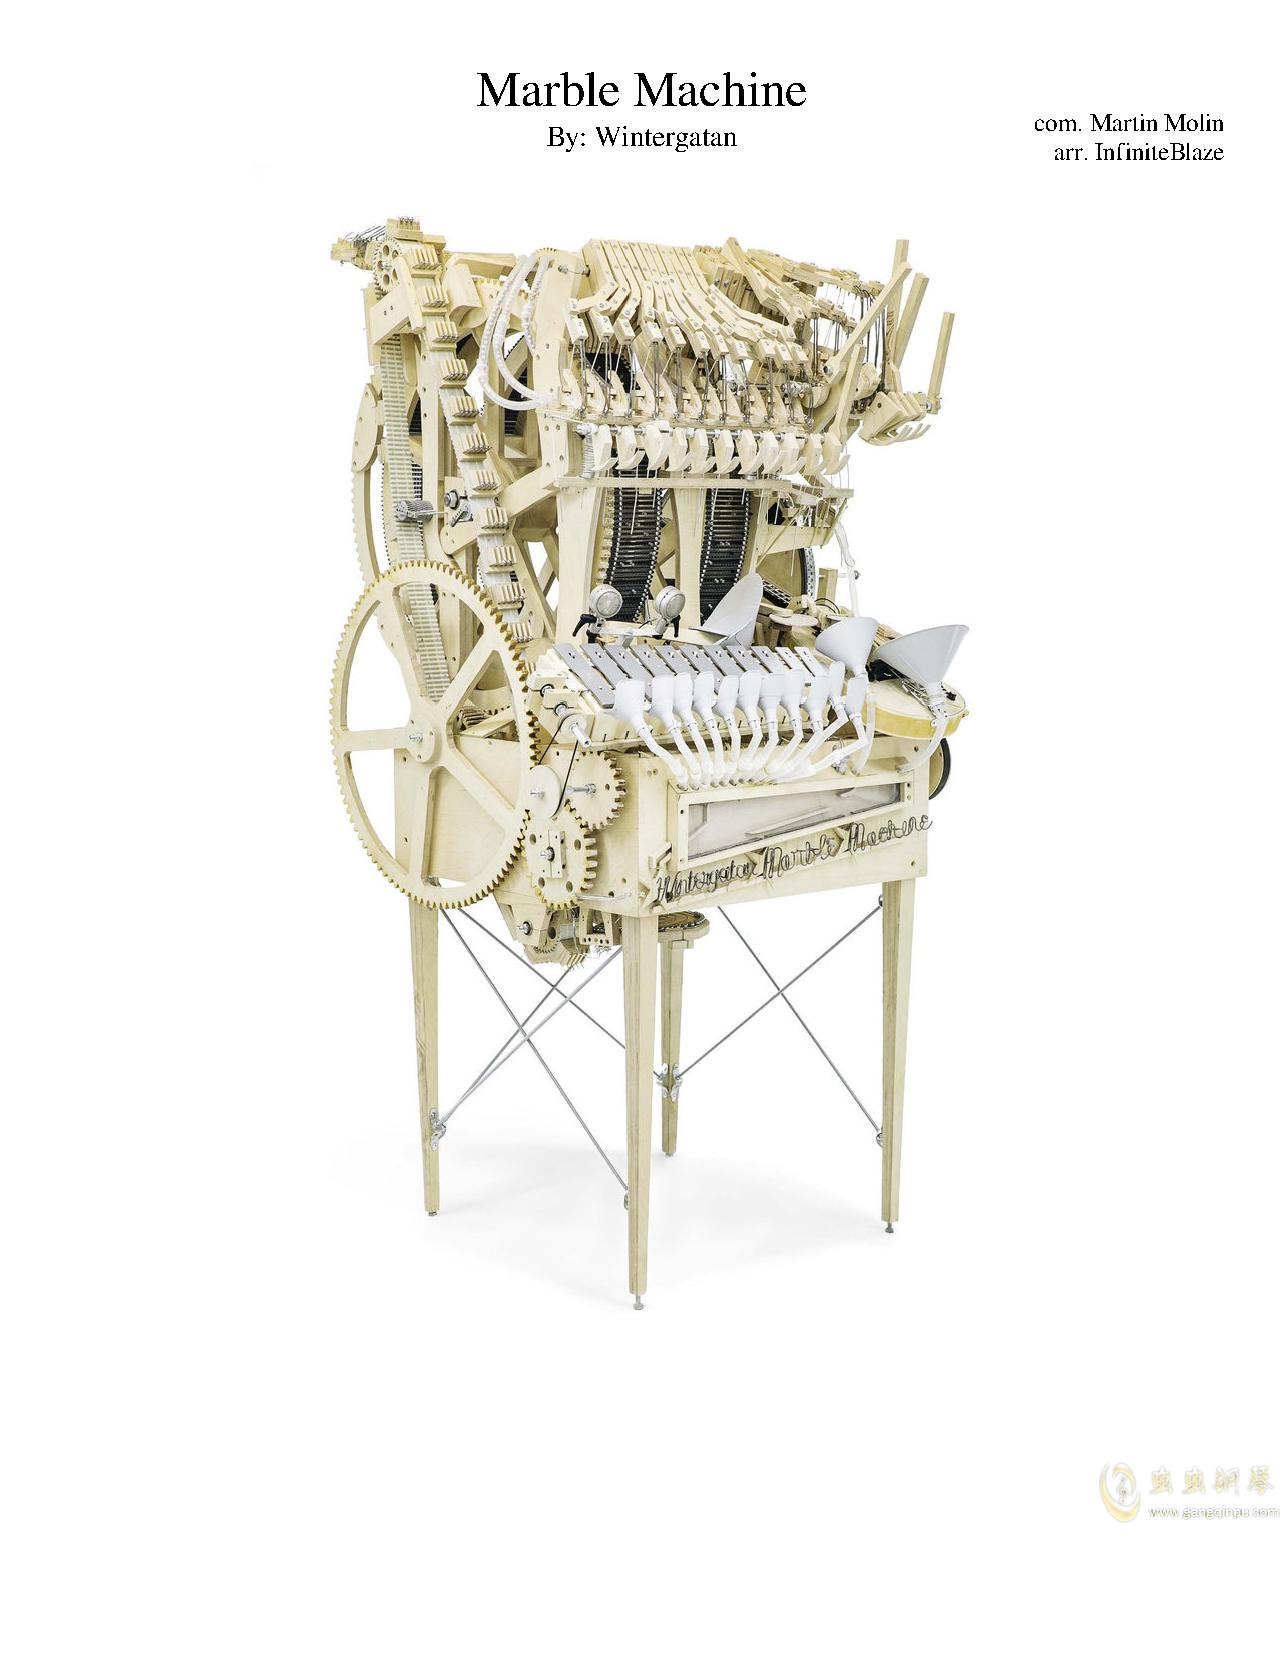 Wintergatan Marble Machine 总谱 ,wintergatan Marble